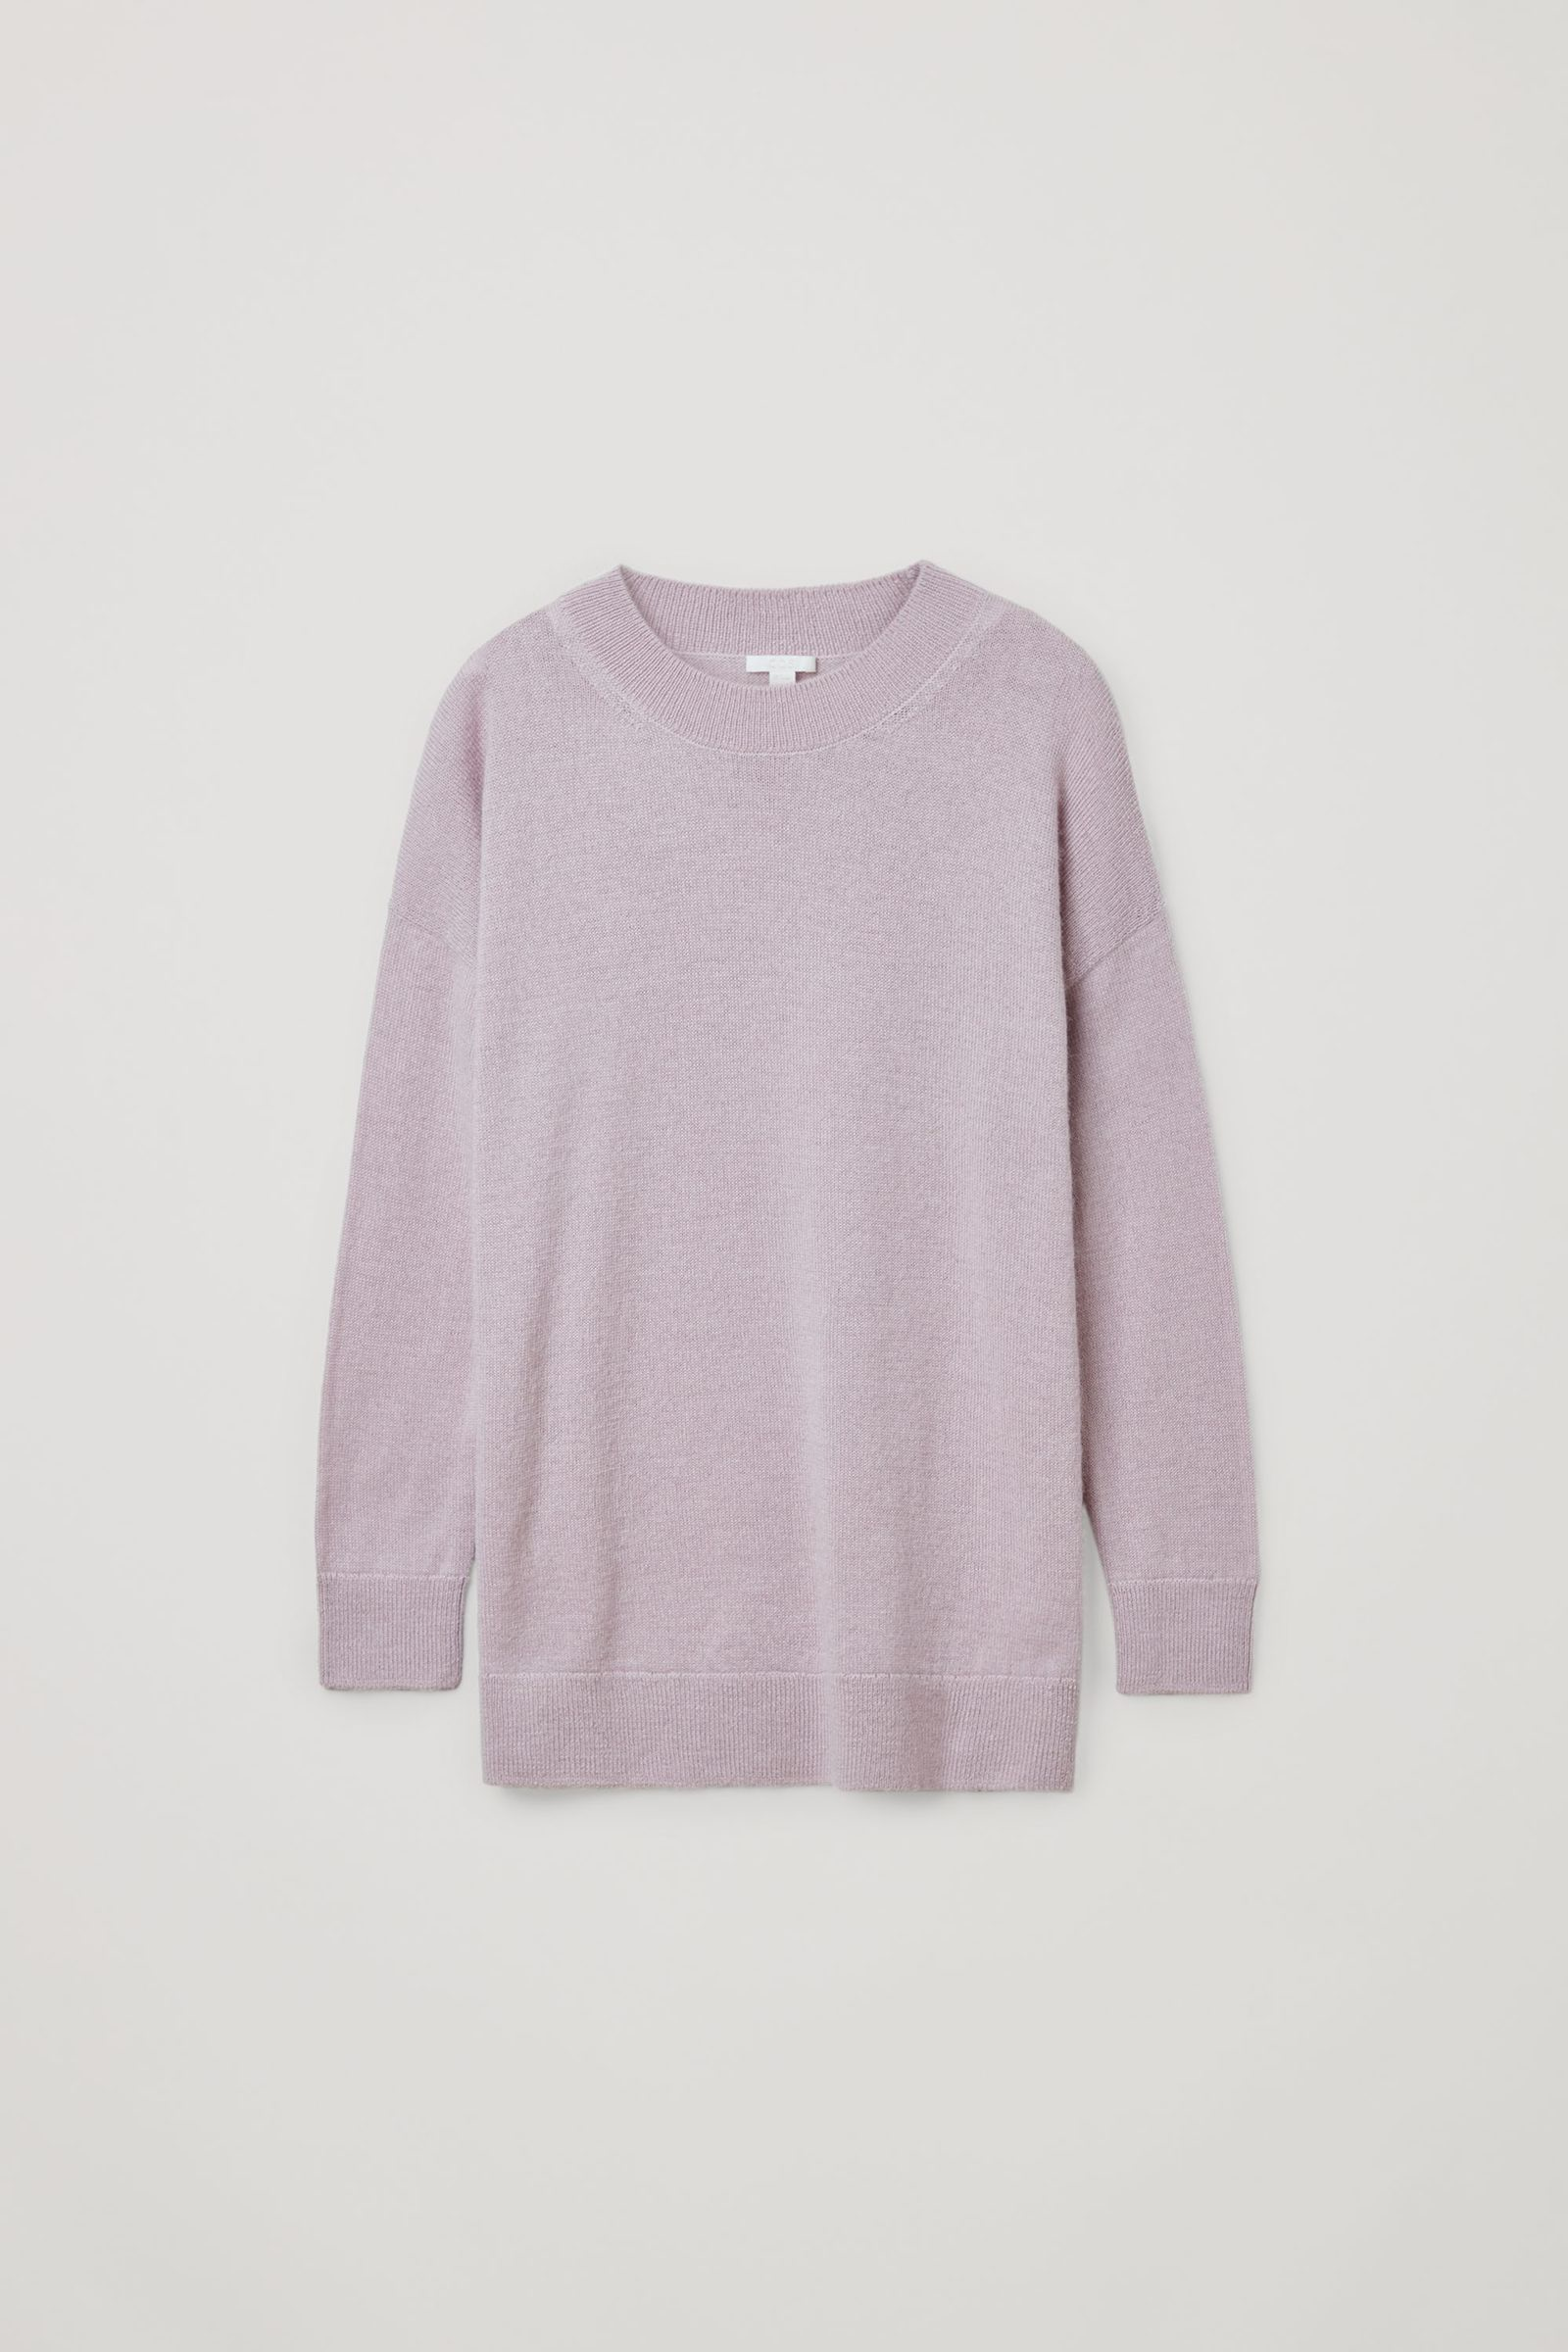 COS 알파카 플레인 니트 스웨터의 핑크컬러 Product입니다.